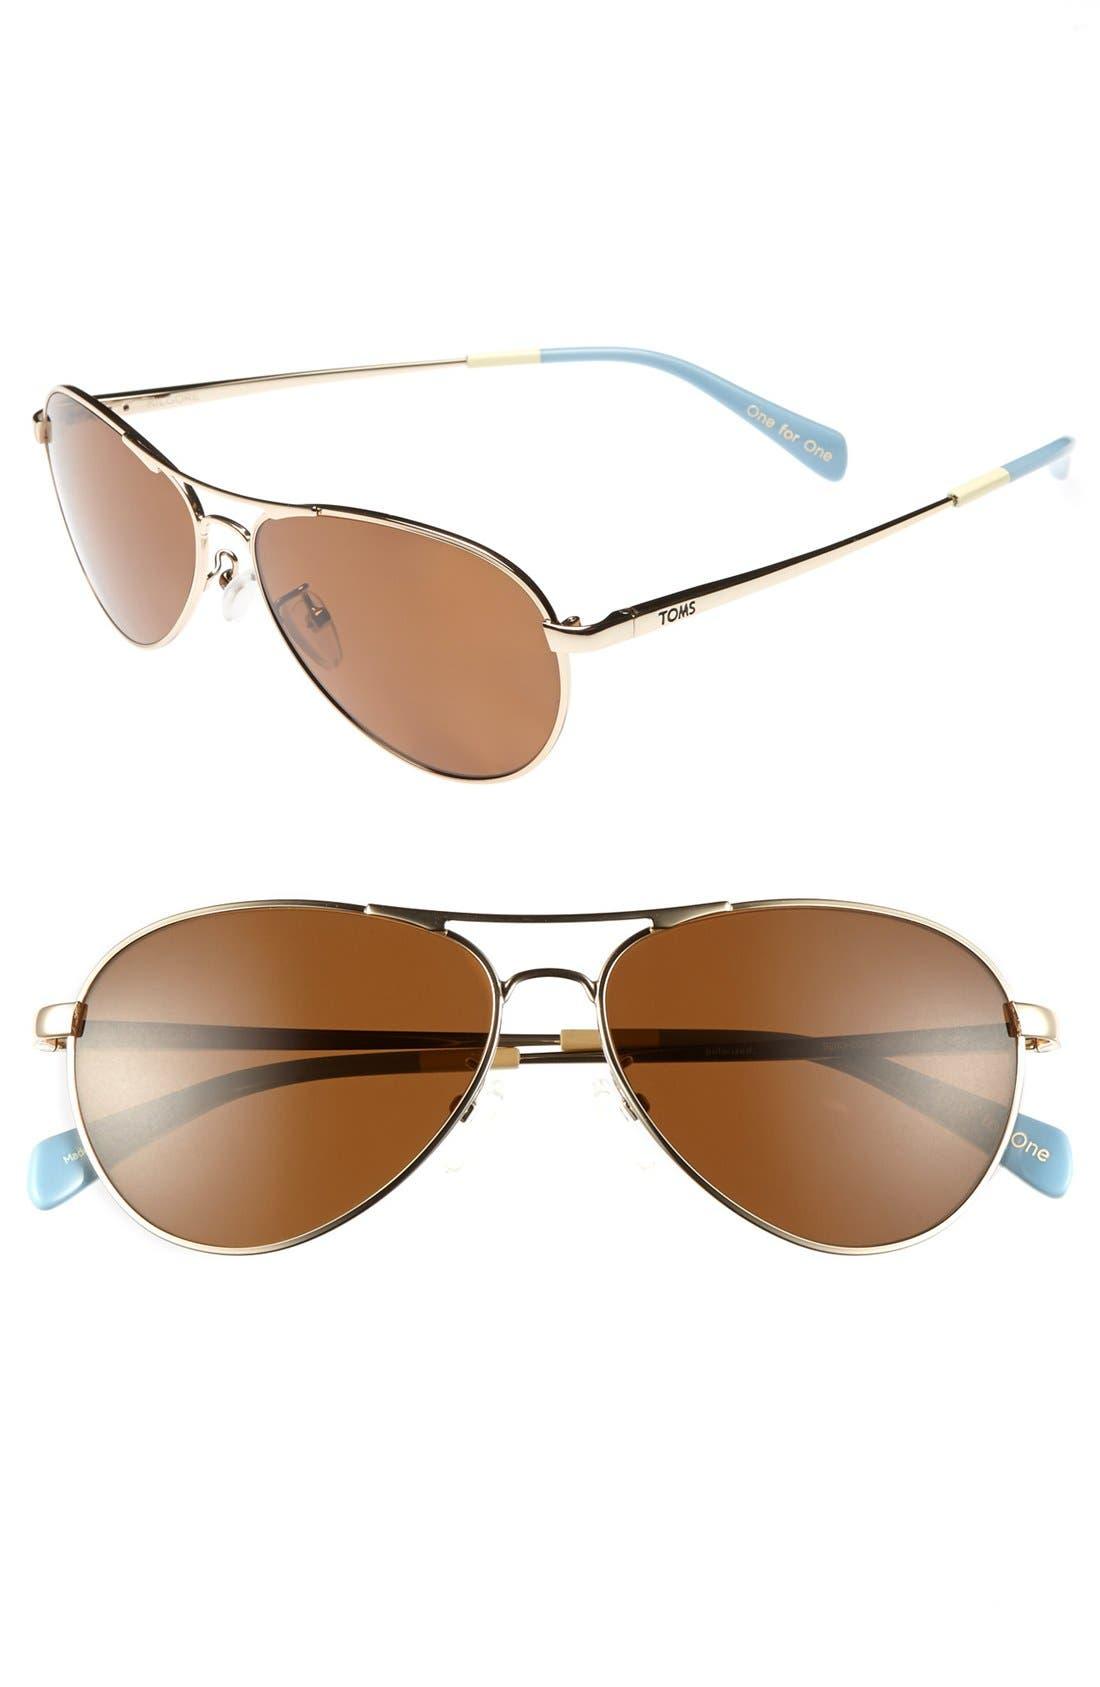 Main Image - TOMS 'Kilgore' 57mm Polarized Aviator Sunglasses